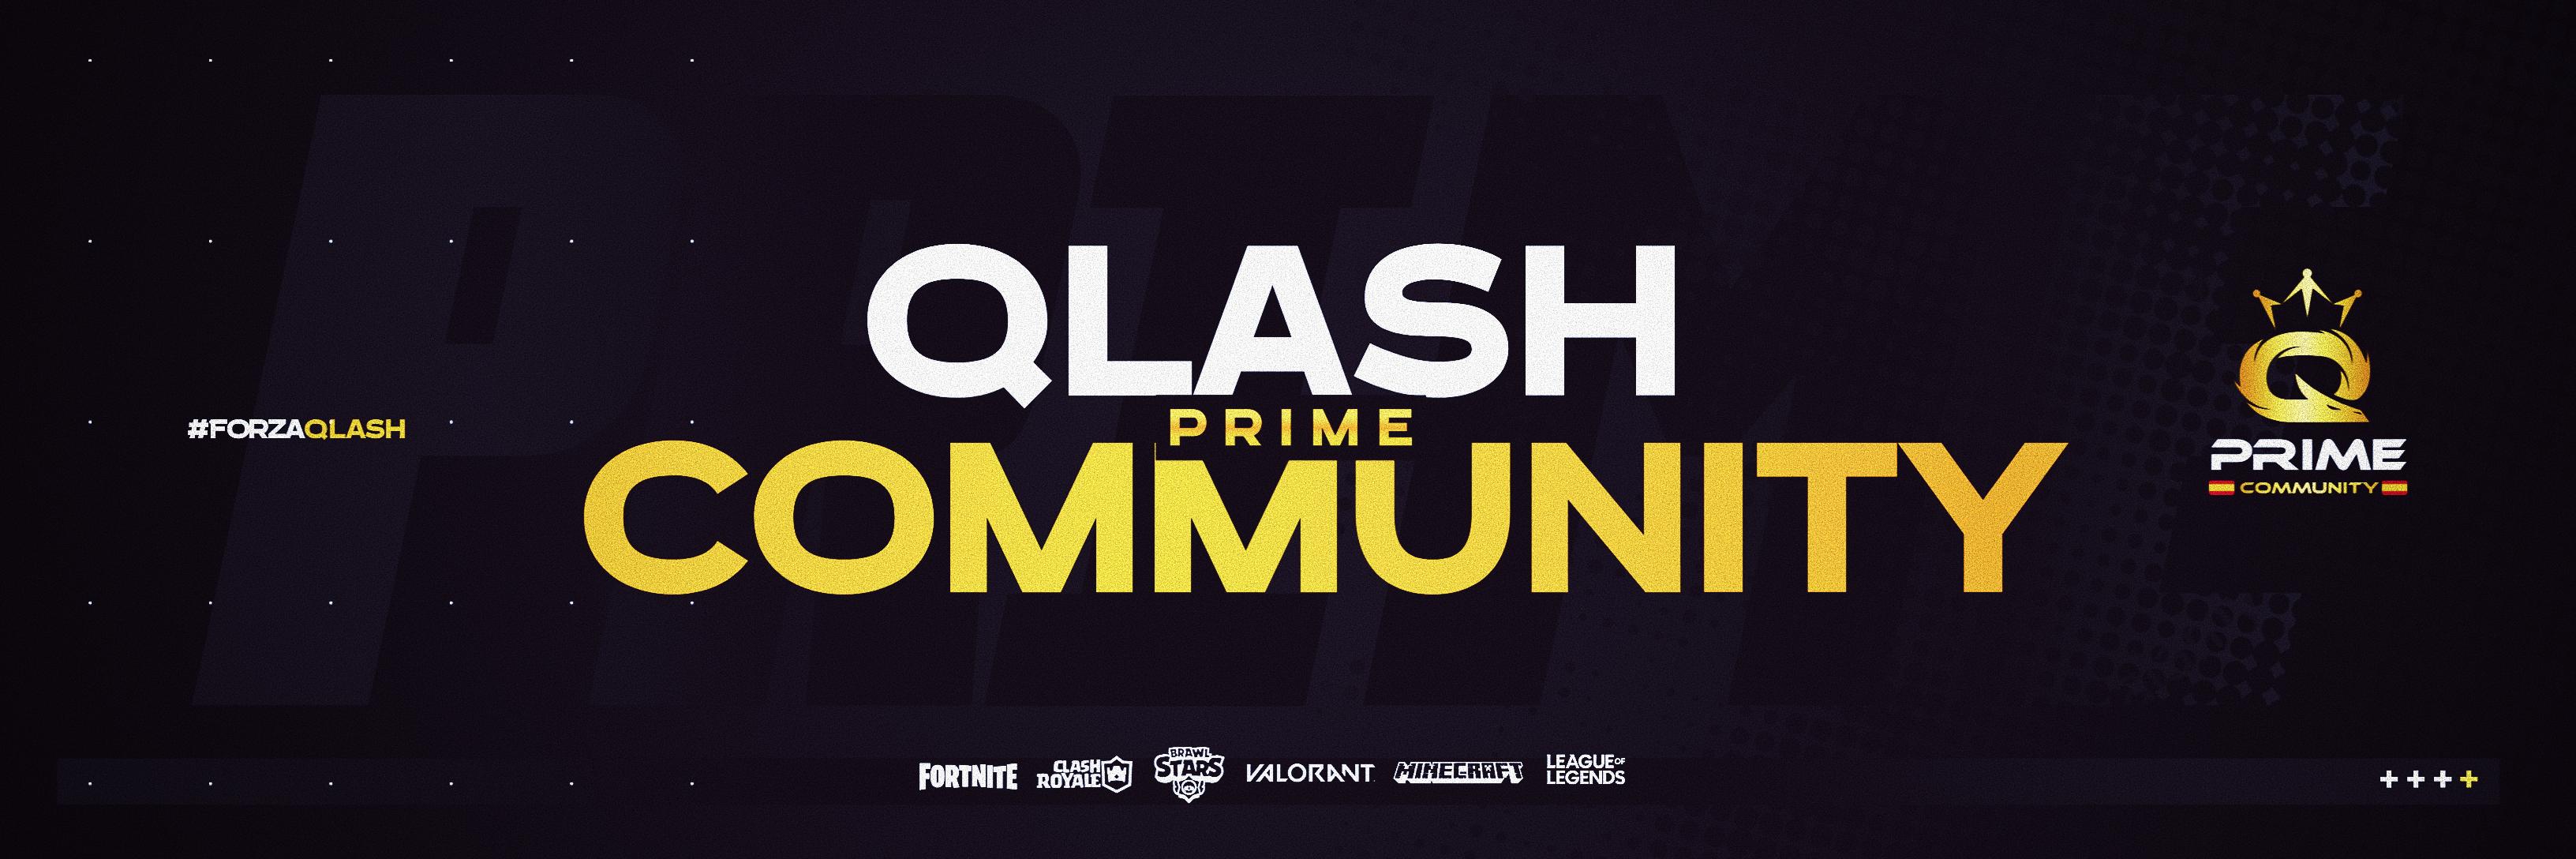 QLASH PRIME COMMUNITY SPAIN